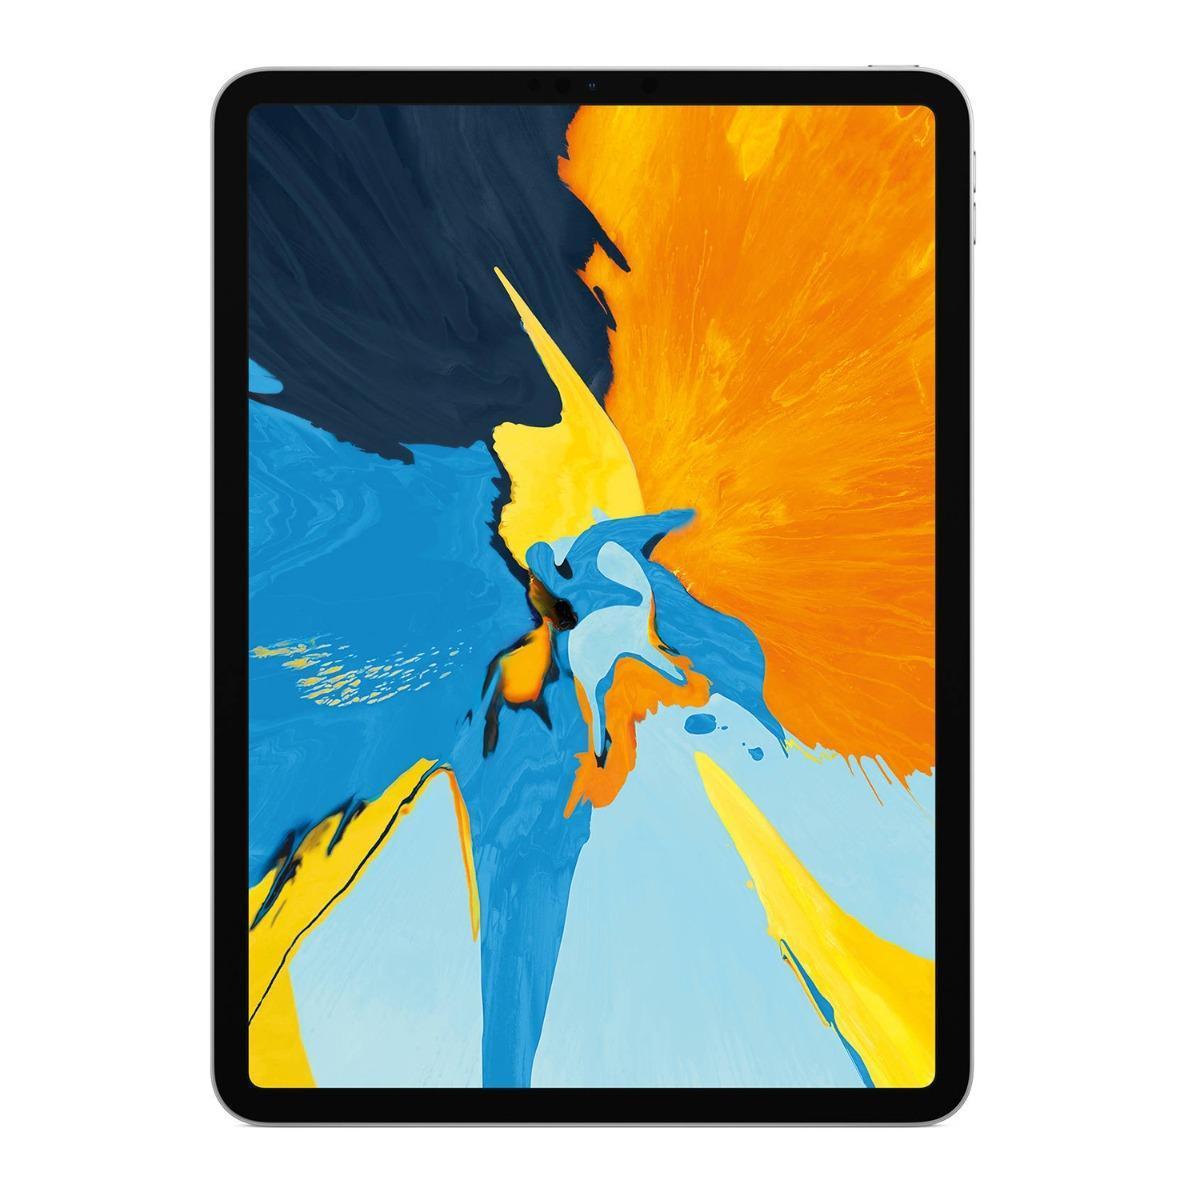 "iPad Pro 11"" (2018) - WLAN + LTE"